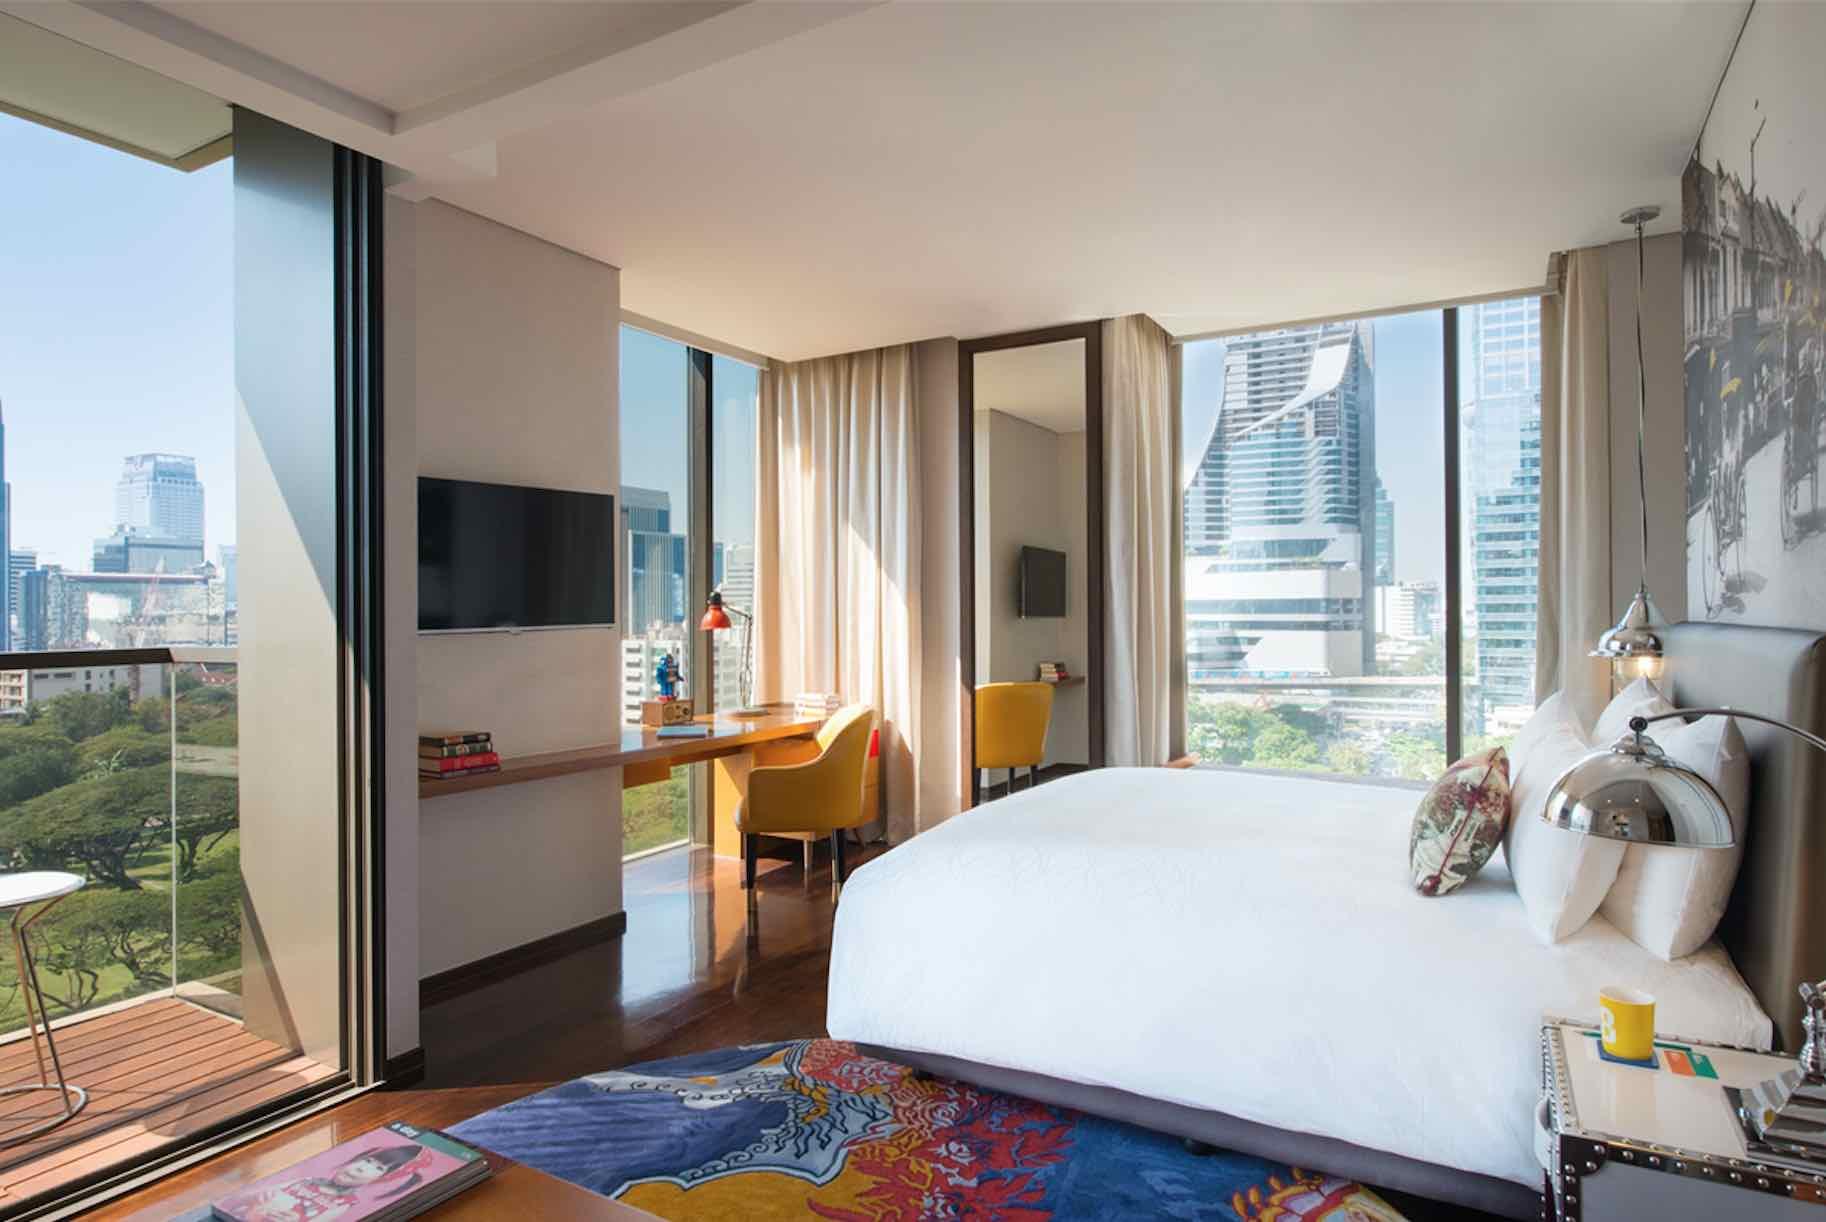 Hotel Indigo Bangkok Rooms - AspirantSG